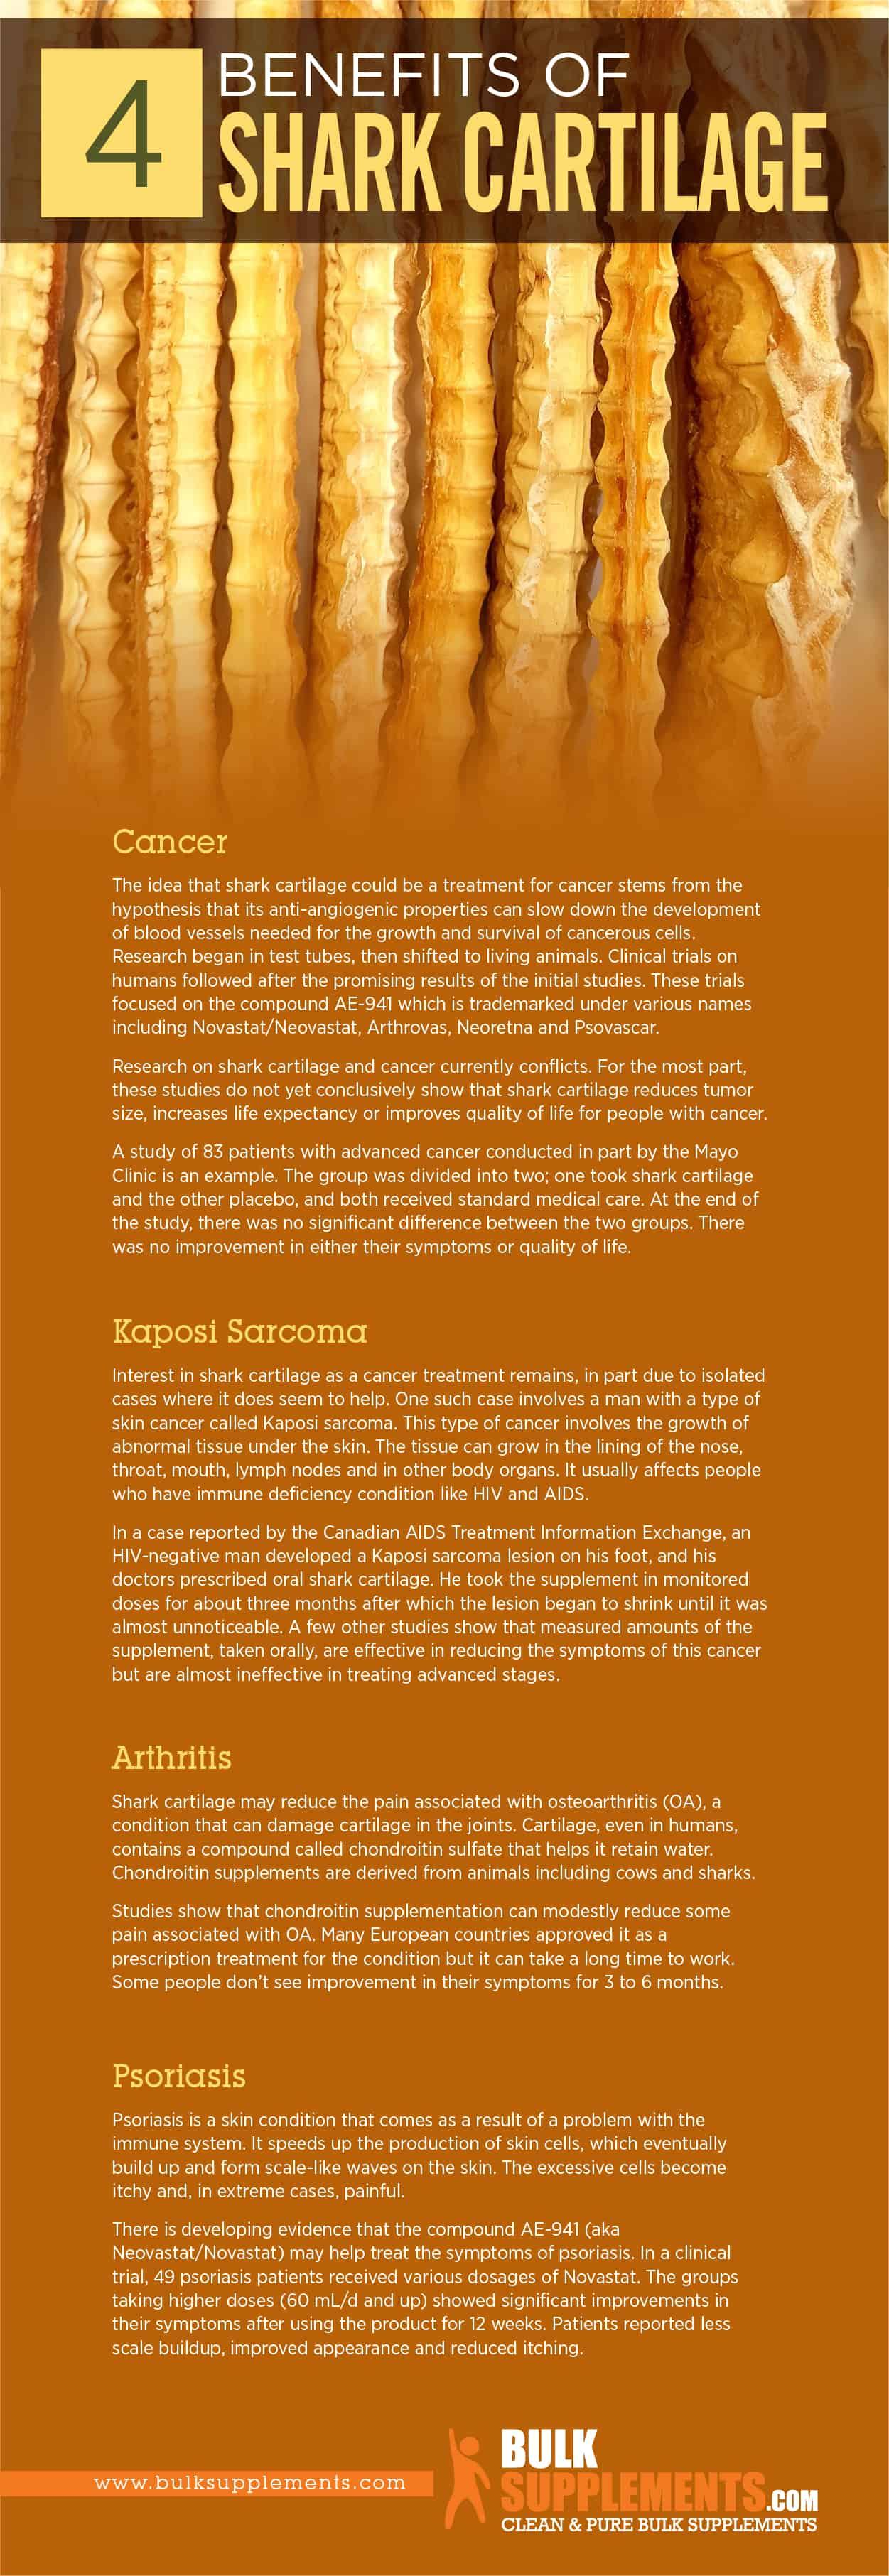 Shark Cartilage Benefits